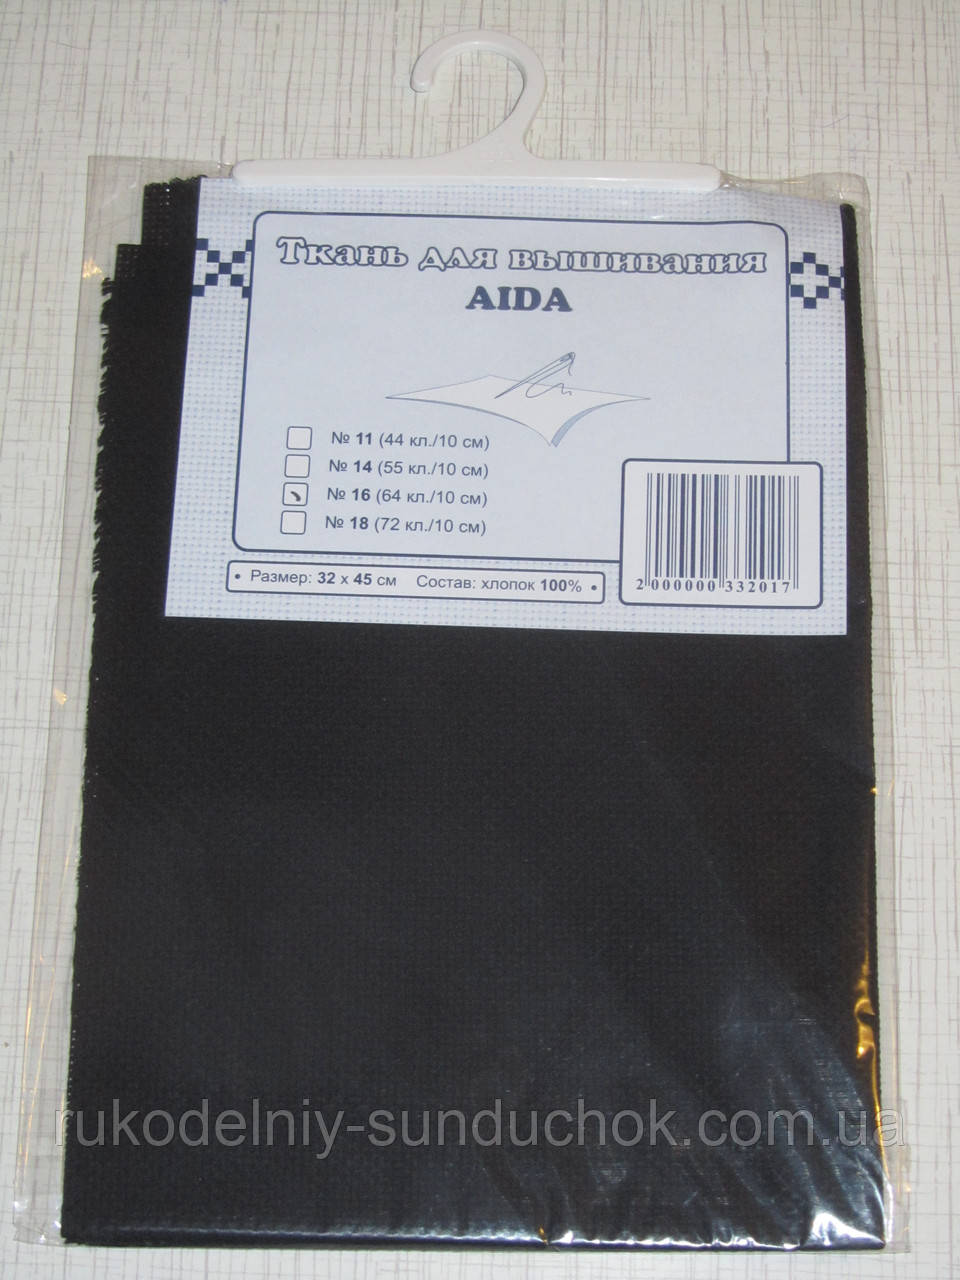 Канва (аида 16) для вышивания, чёрная (32*45 см)